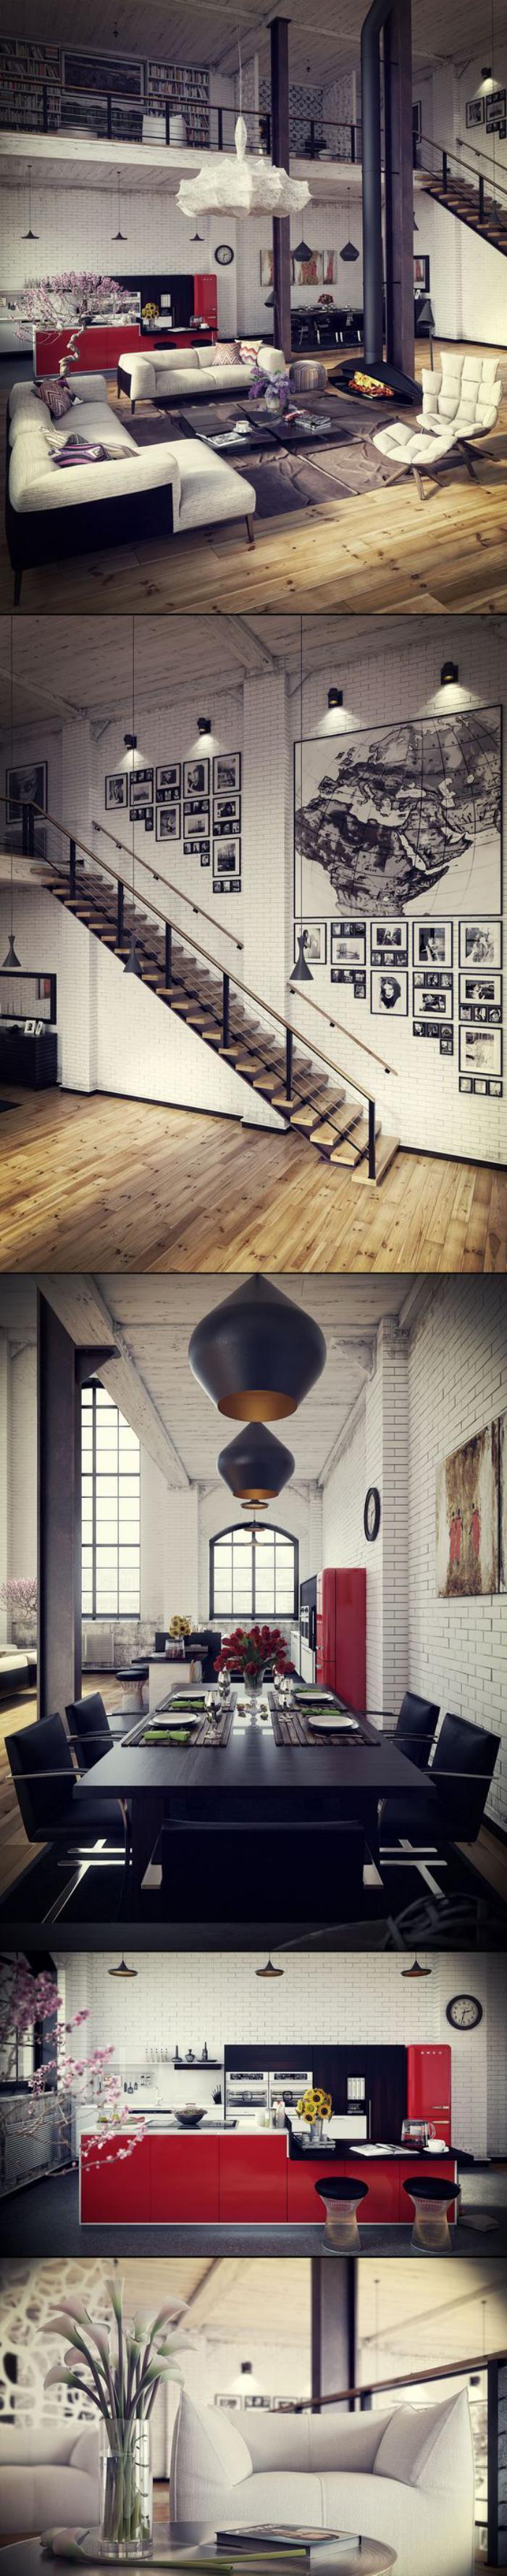 escalier-modulaire-escalier-modulable-bois-et-fer-escaliers-modulaires